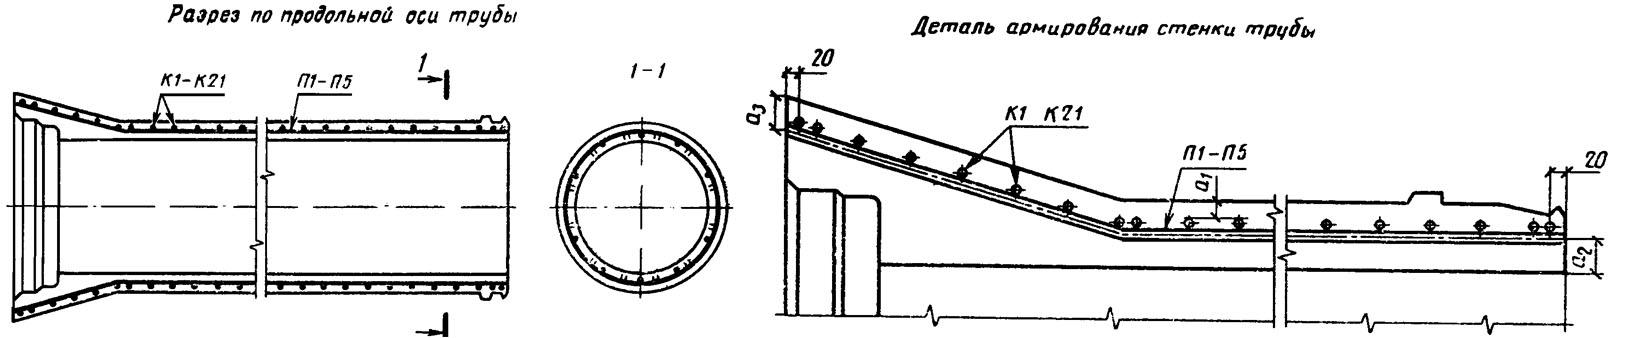 Размер трубы - схема